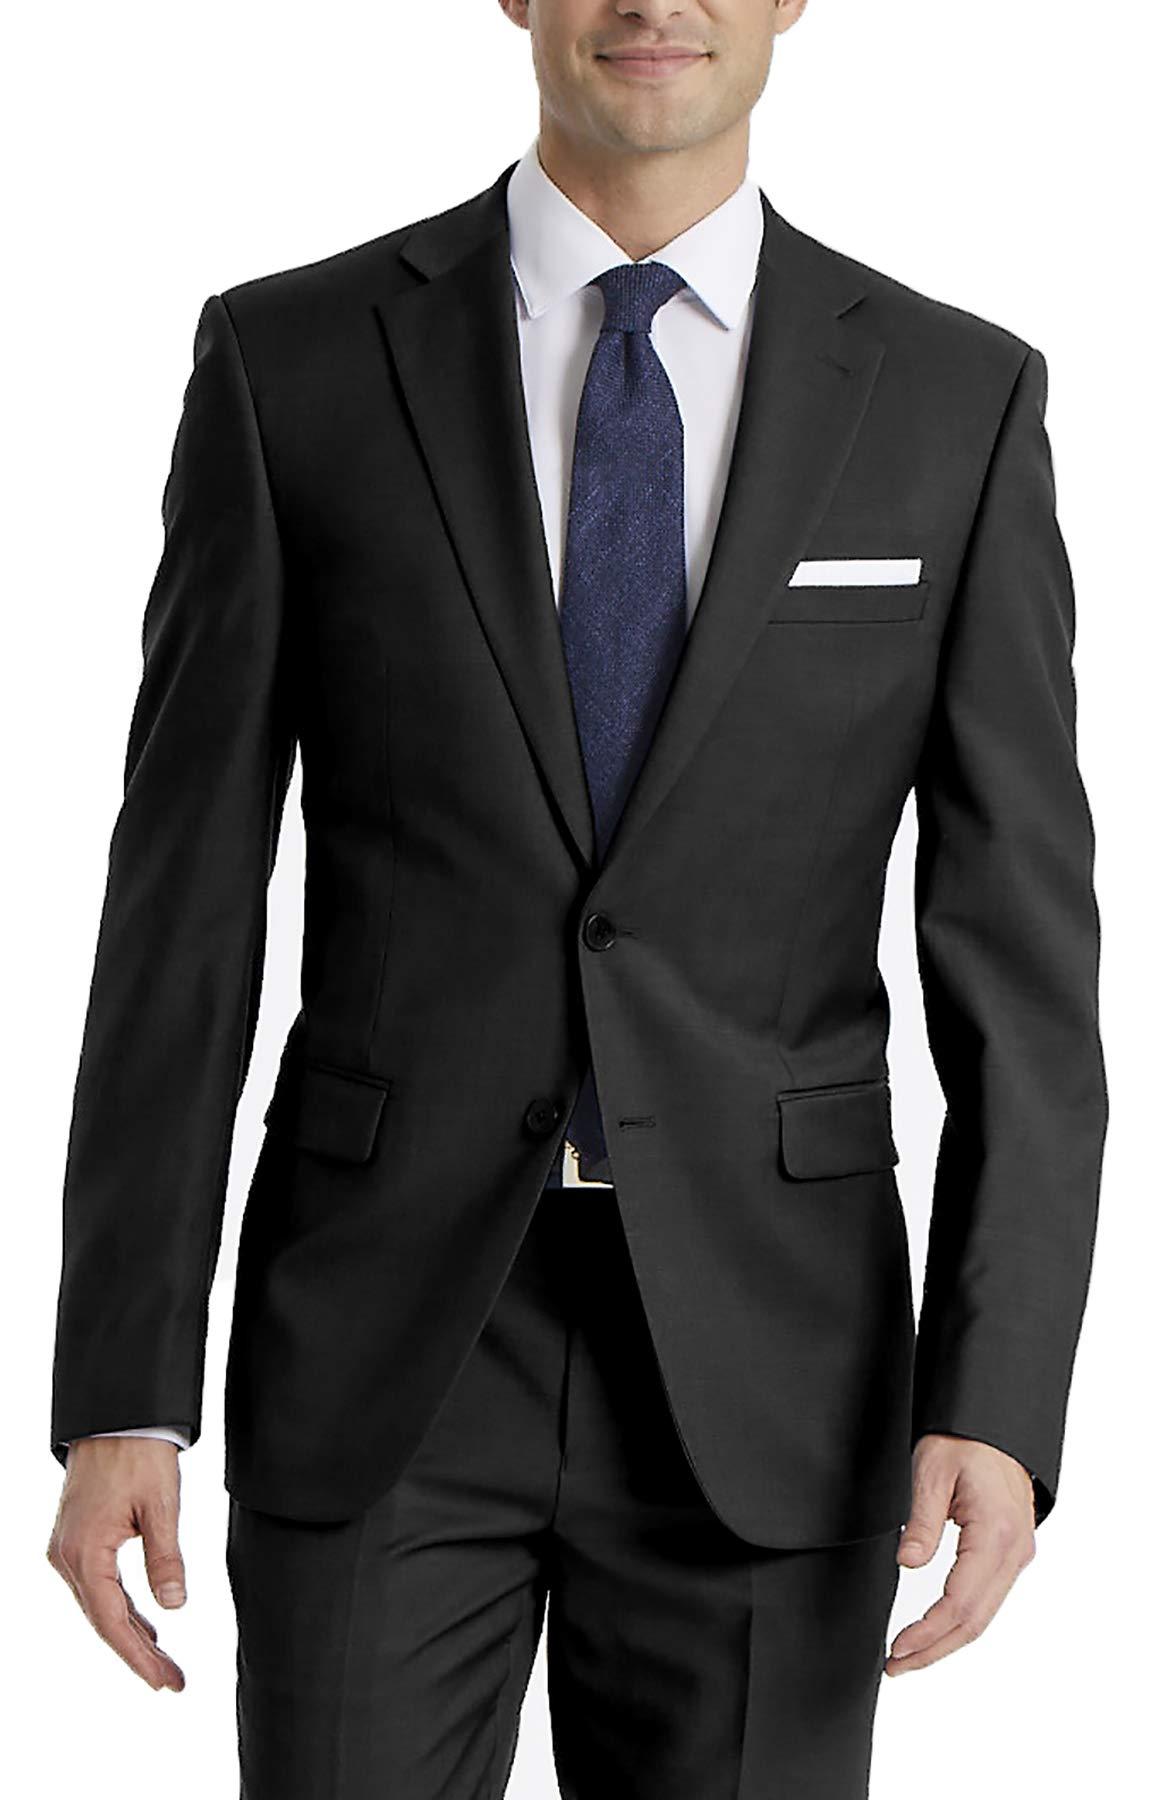 Calvin Klein Men's Slim Fit Stretch Suit Separates-Custom Jacket & Pant Size Selection, Black Jacket, 40 Regular by Calvin Klein